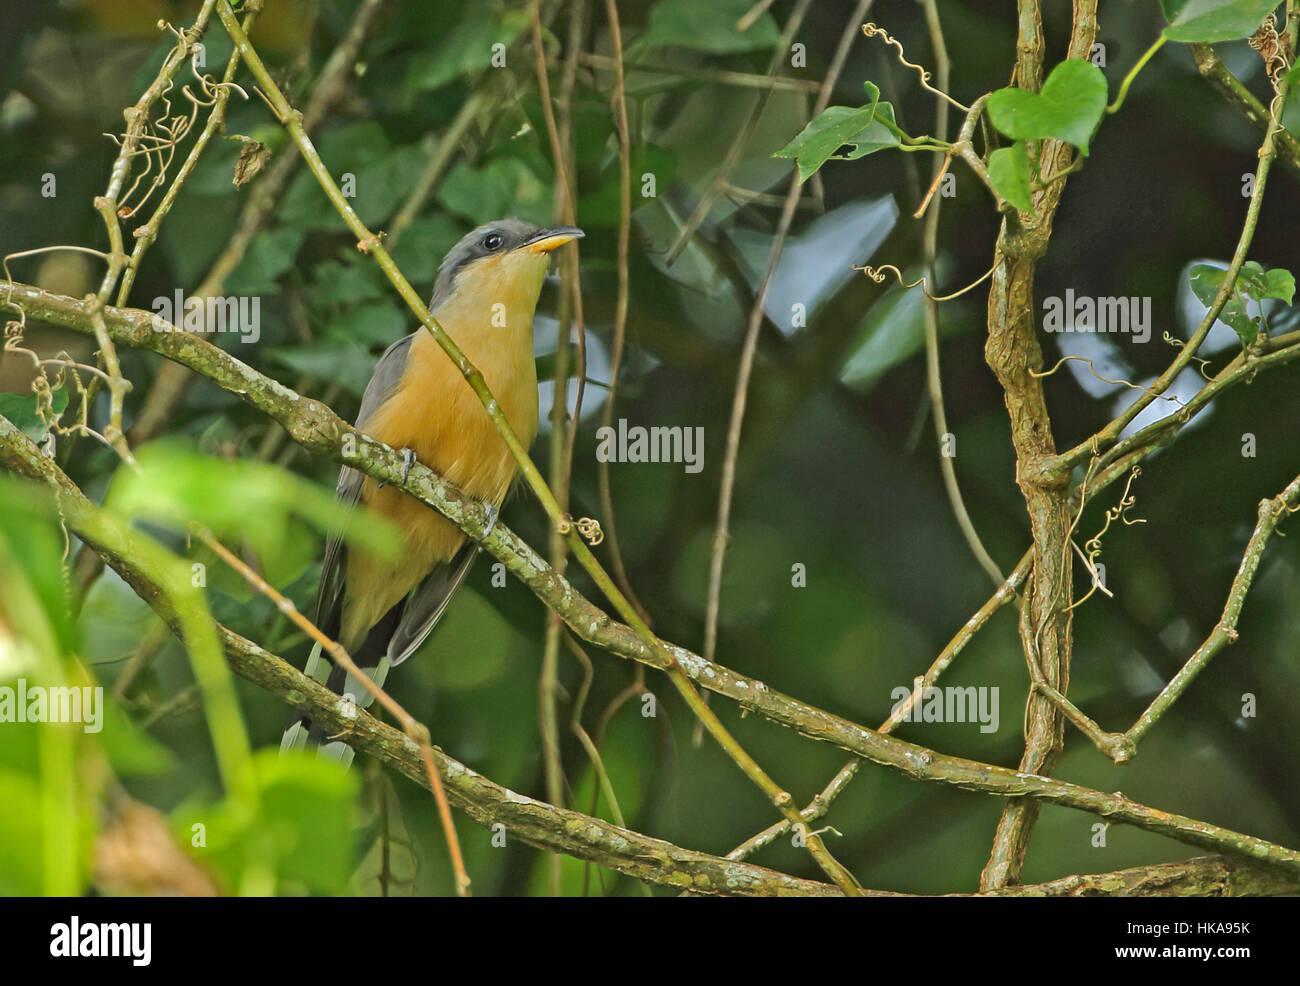 Mangrove Cuckoo (Coccyzus minor) adult perched on vine  Fond Doux Plantation, St Lucia, Lesser Antilles      November - Stock Image